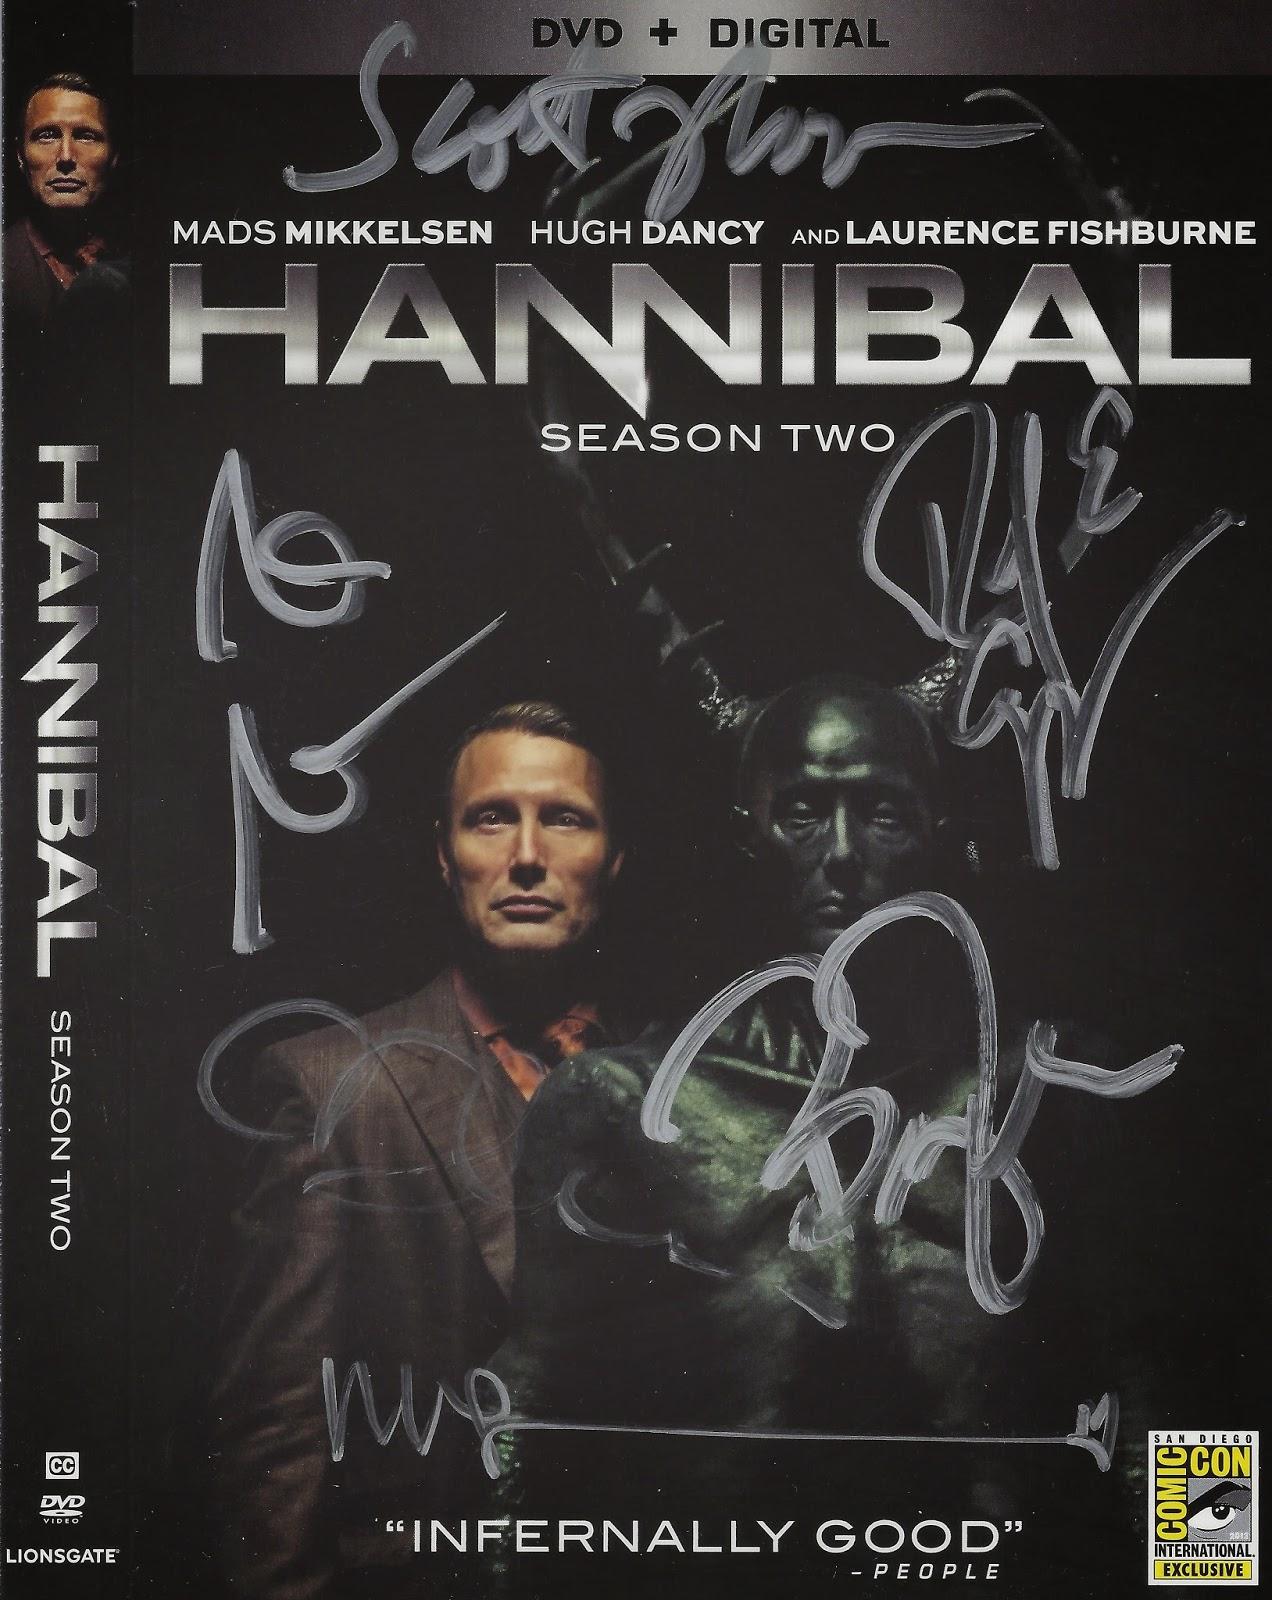 Hannibal Signing Lionsgate #SDCC 2014   Autograph Hound's Blah Blah Blog